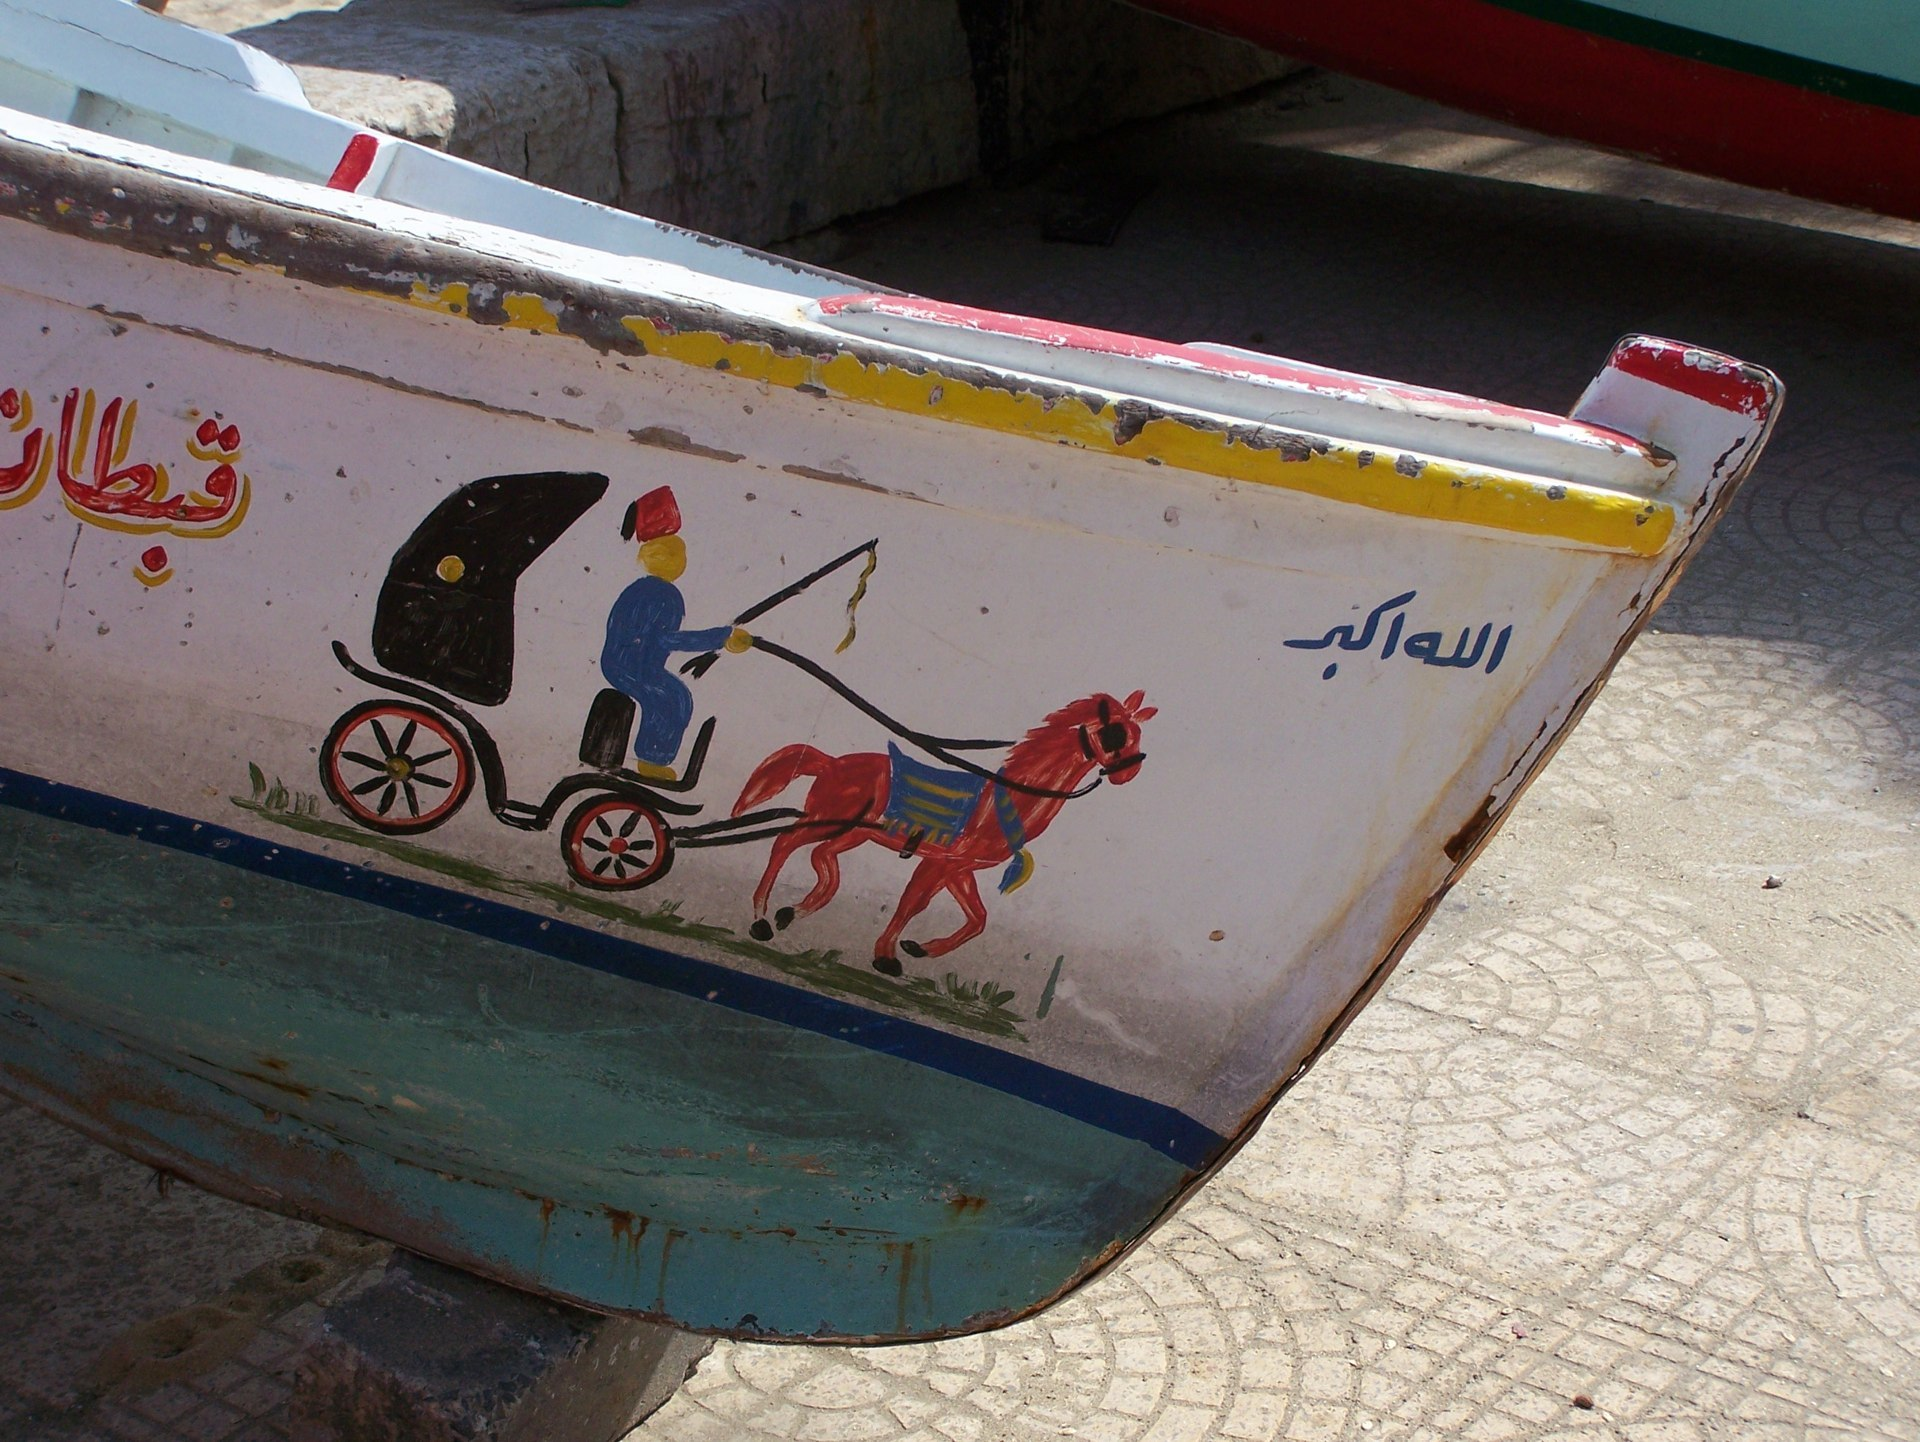 Bemalter Schiffsbug, Alexandria